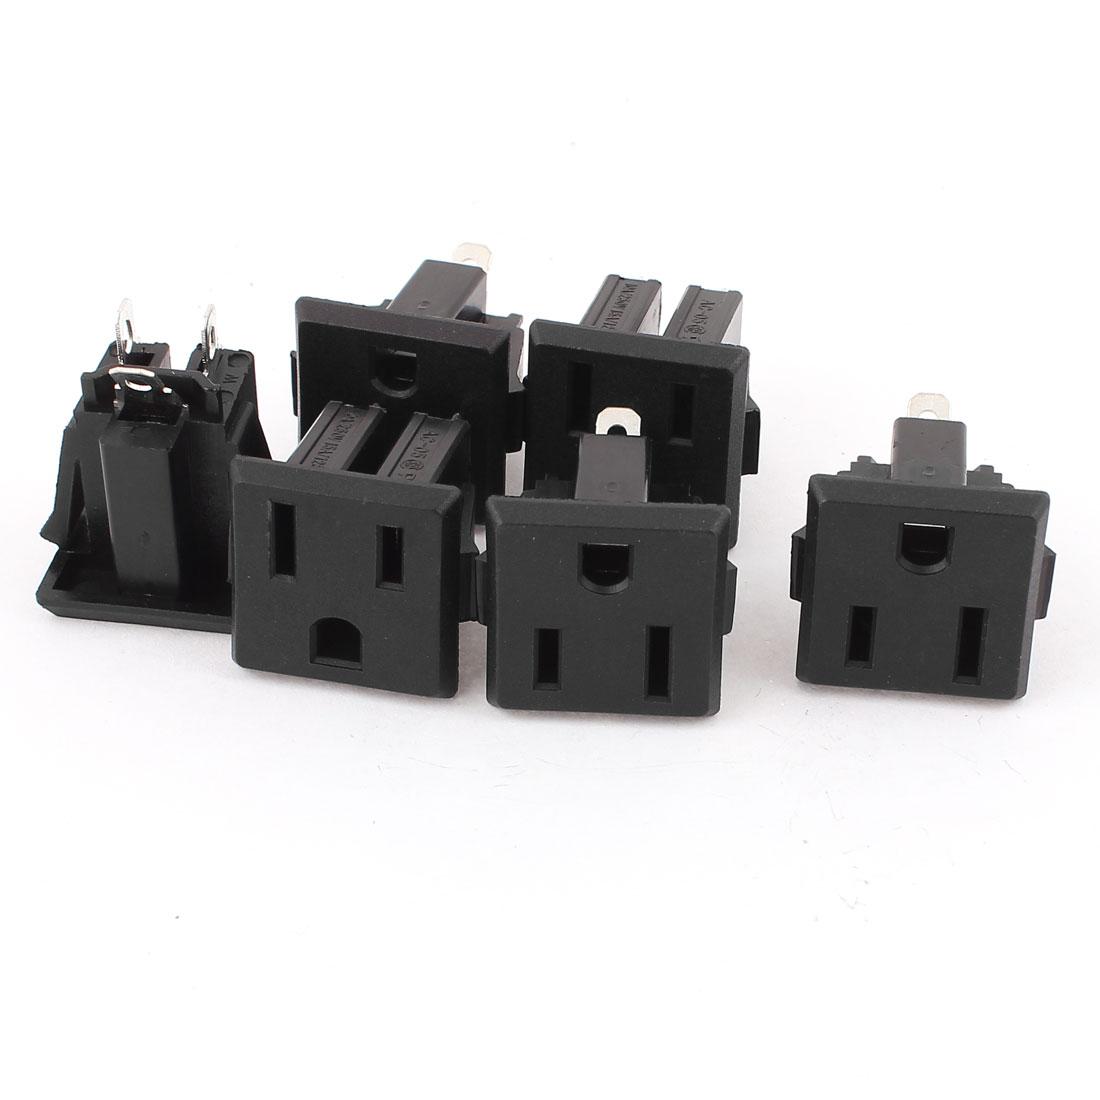 6 Pcs AC 110V-250V 15A Panel Mount Power Socket Connector Black for US 2Pin Plug